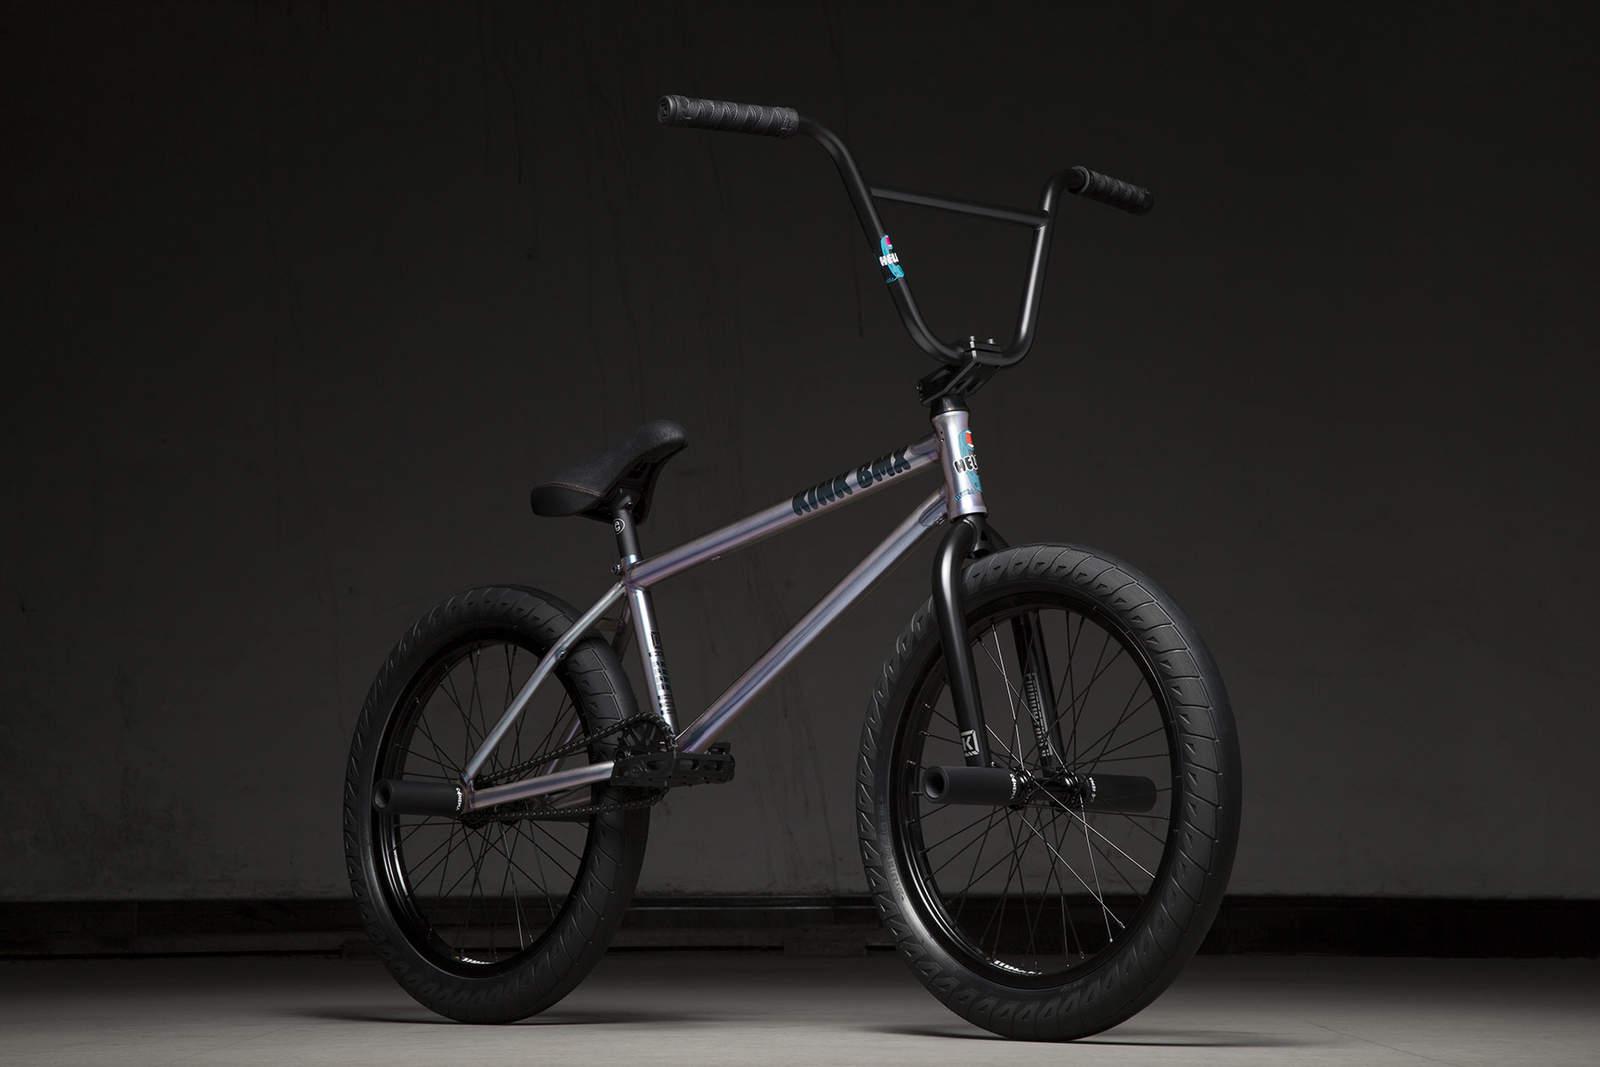 http://uploads.bmxmuseum.com/user-images/199820/bikes_20_williams_k490raw20_3q5d17d0dd23.jpg